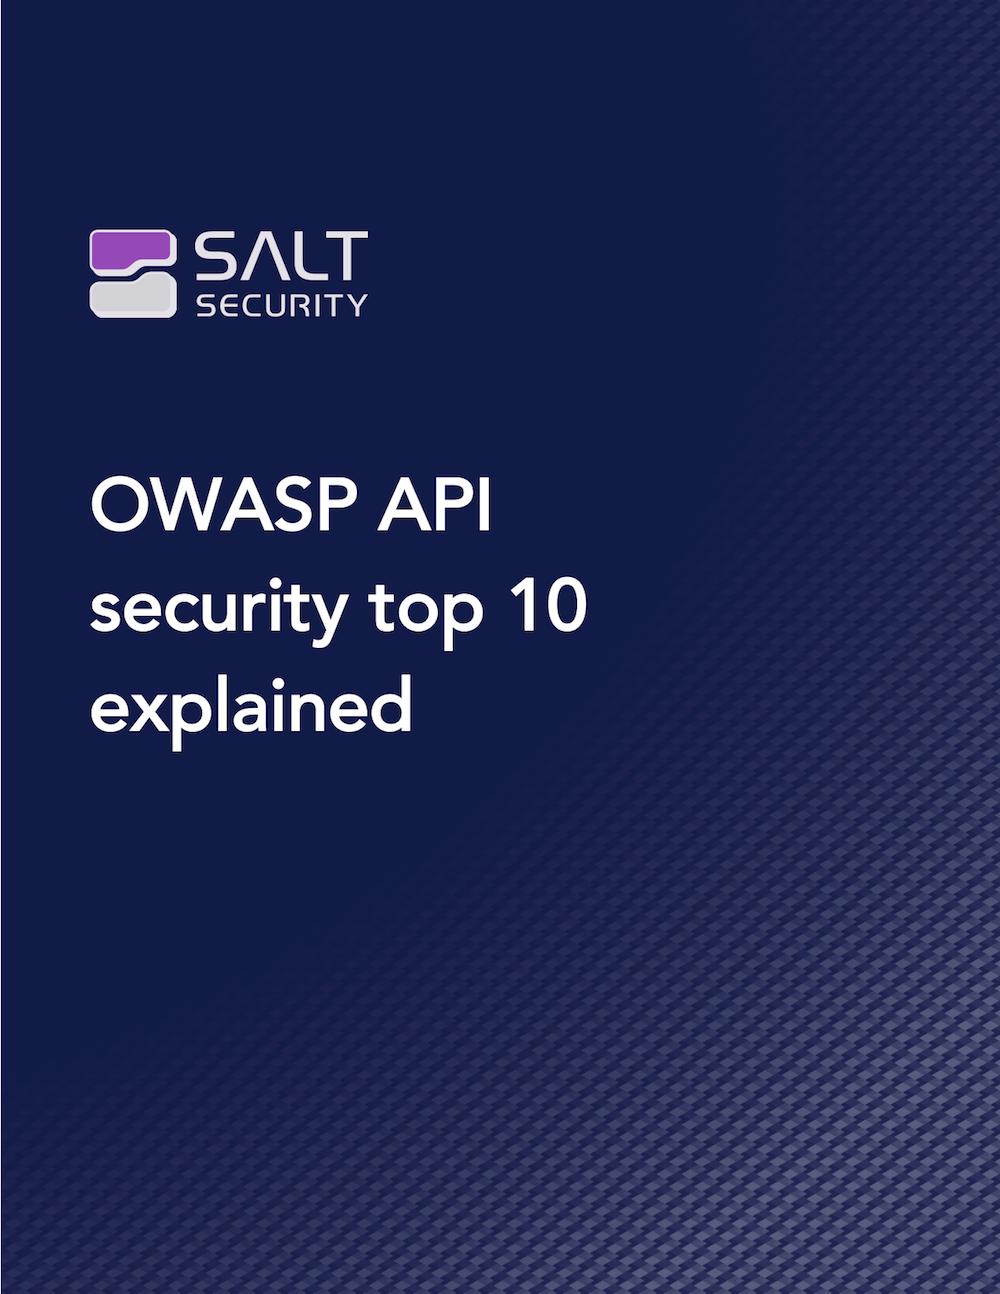 OWASP API Security Top 10 Explained